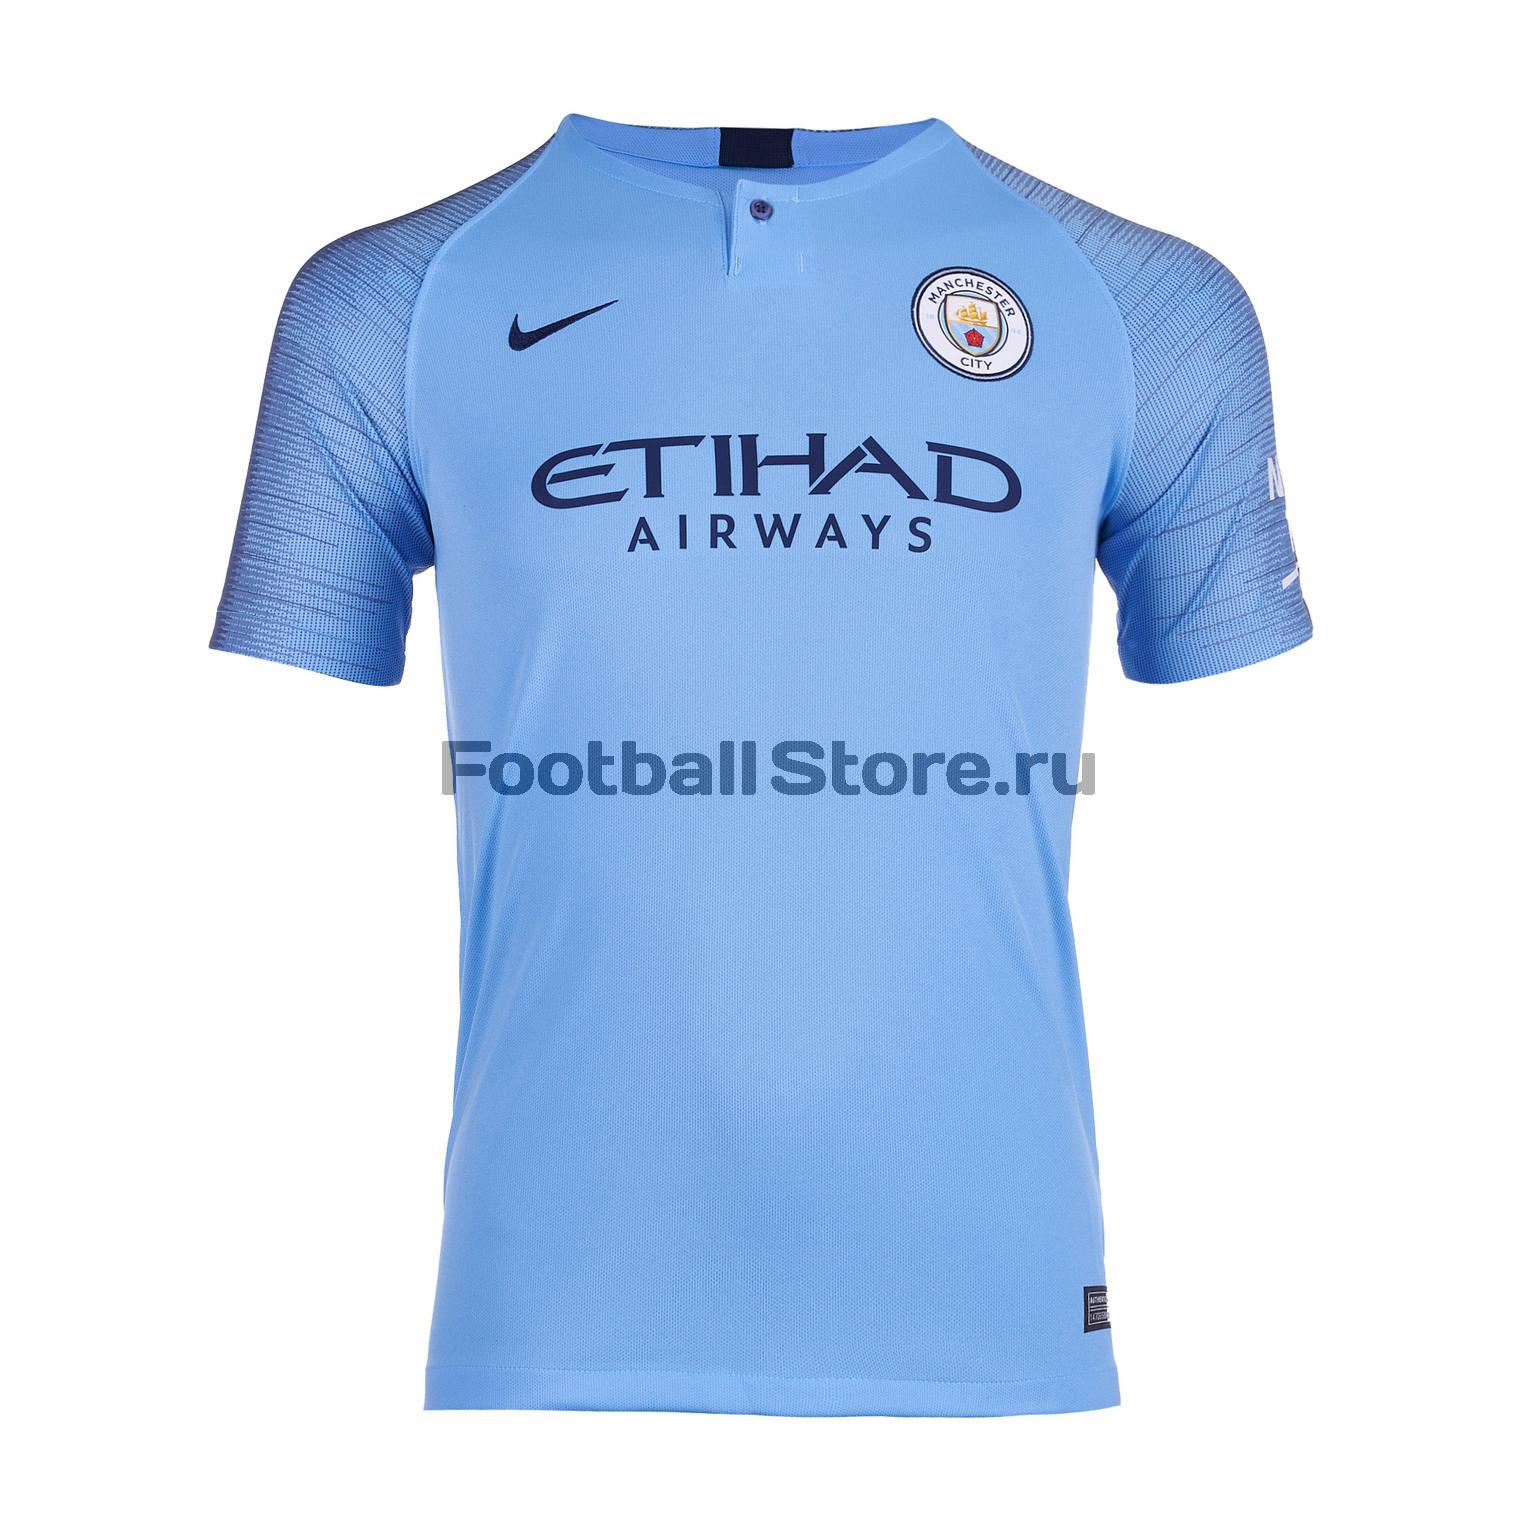 Футболка подростковая домашняя Nike Manchester City 2018/2019 футболка nike manchester city 898623 488